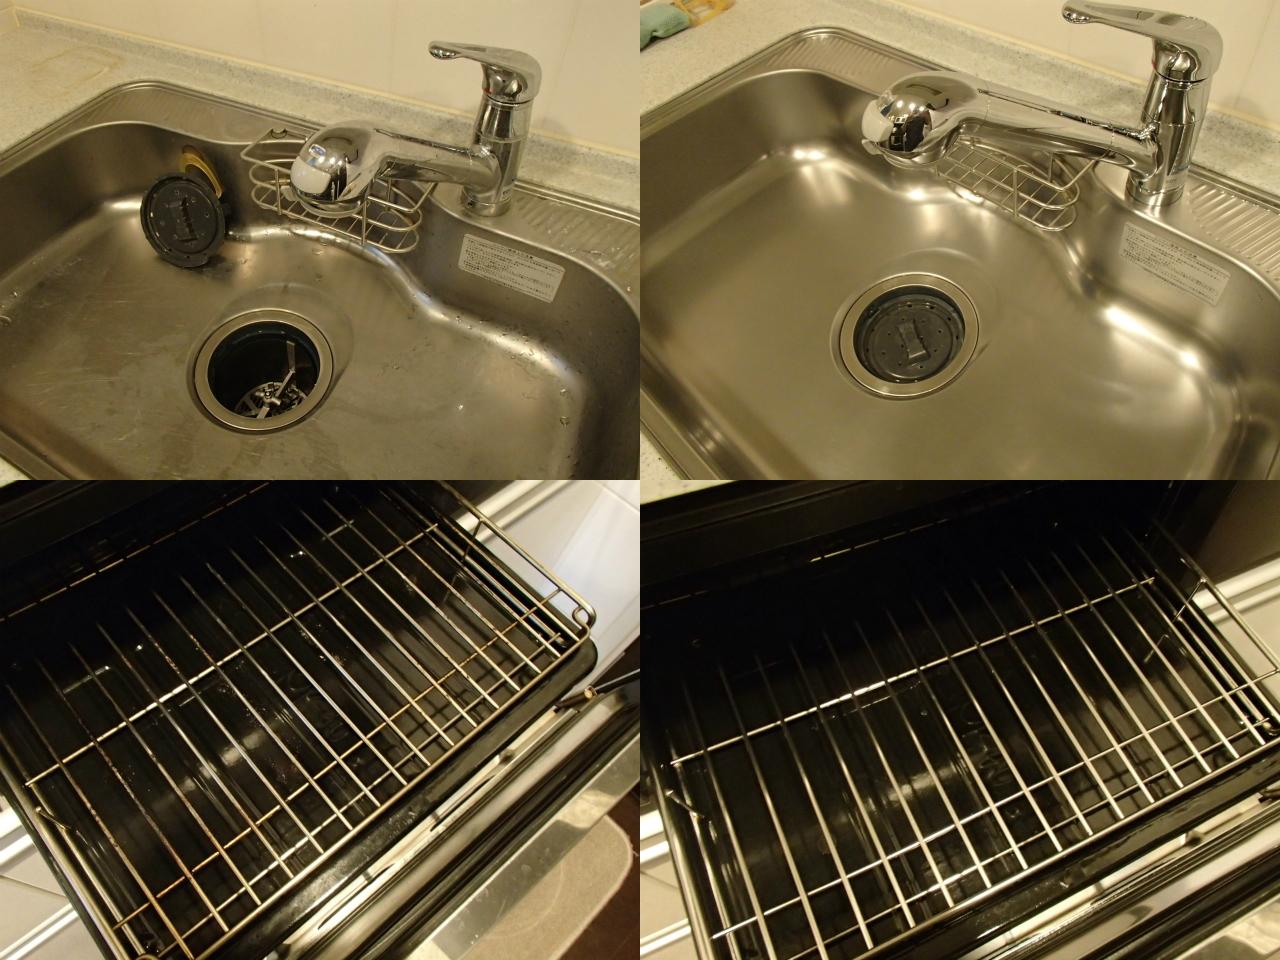 http://ajras.net/images/121203-kitchen.jpg